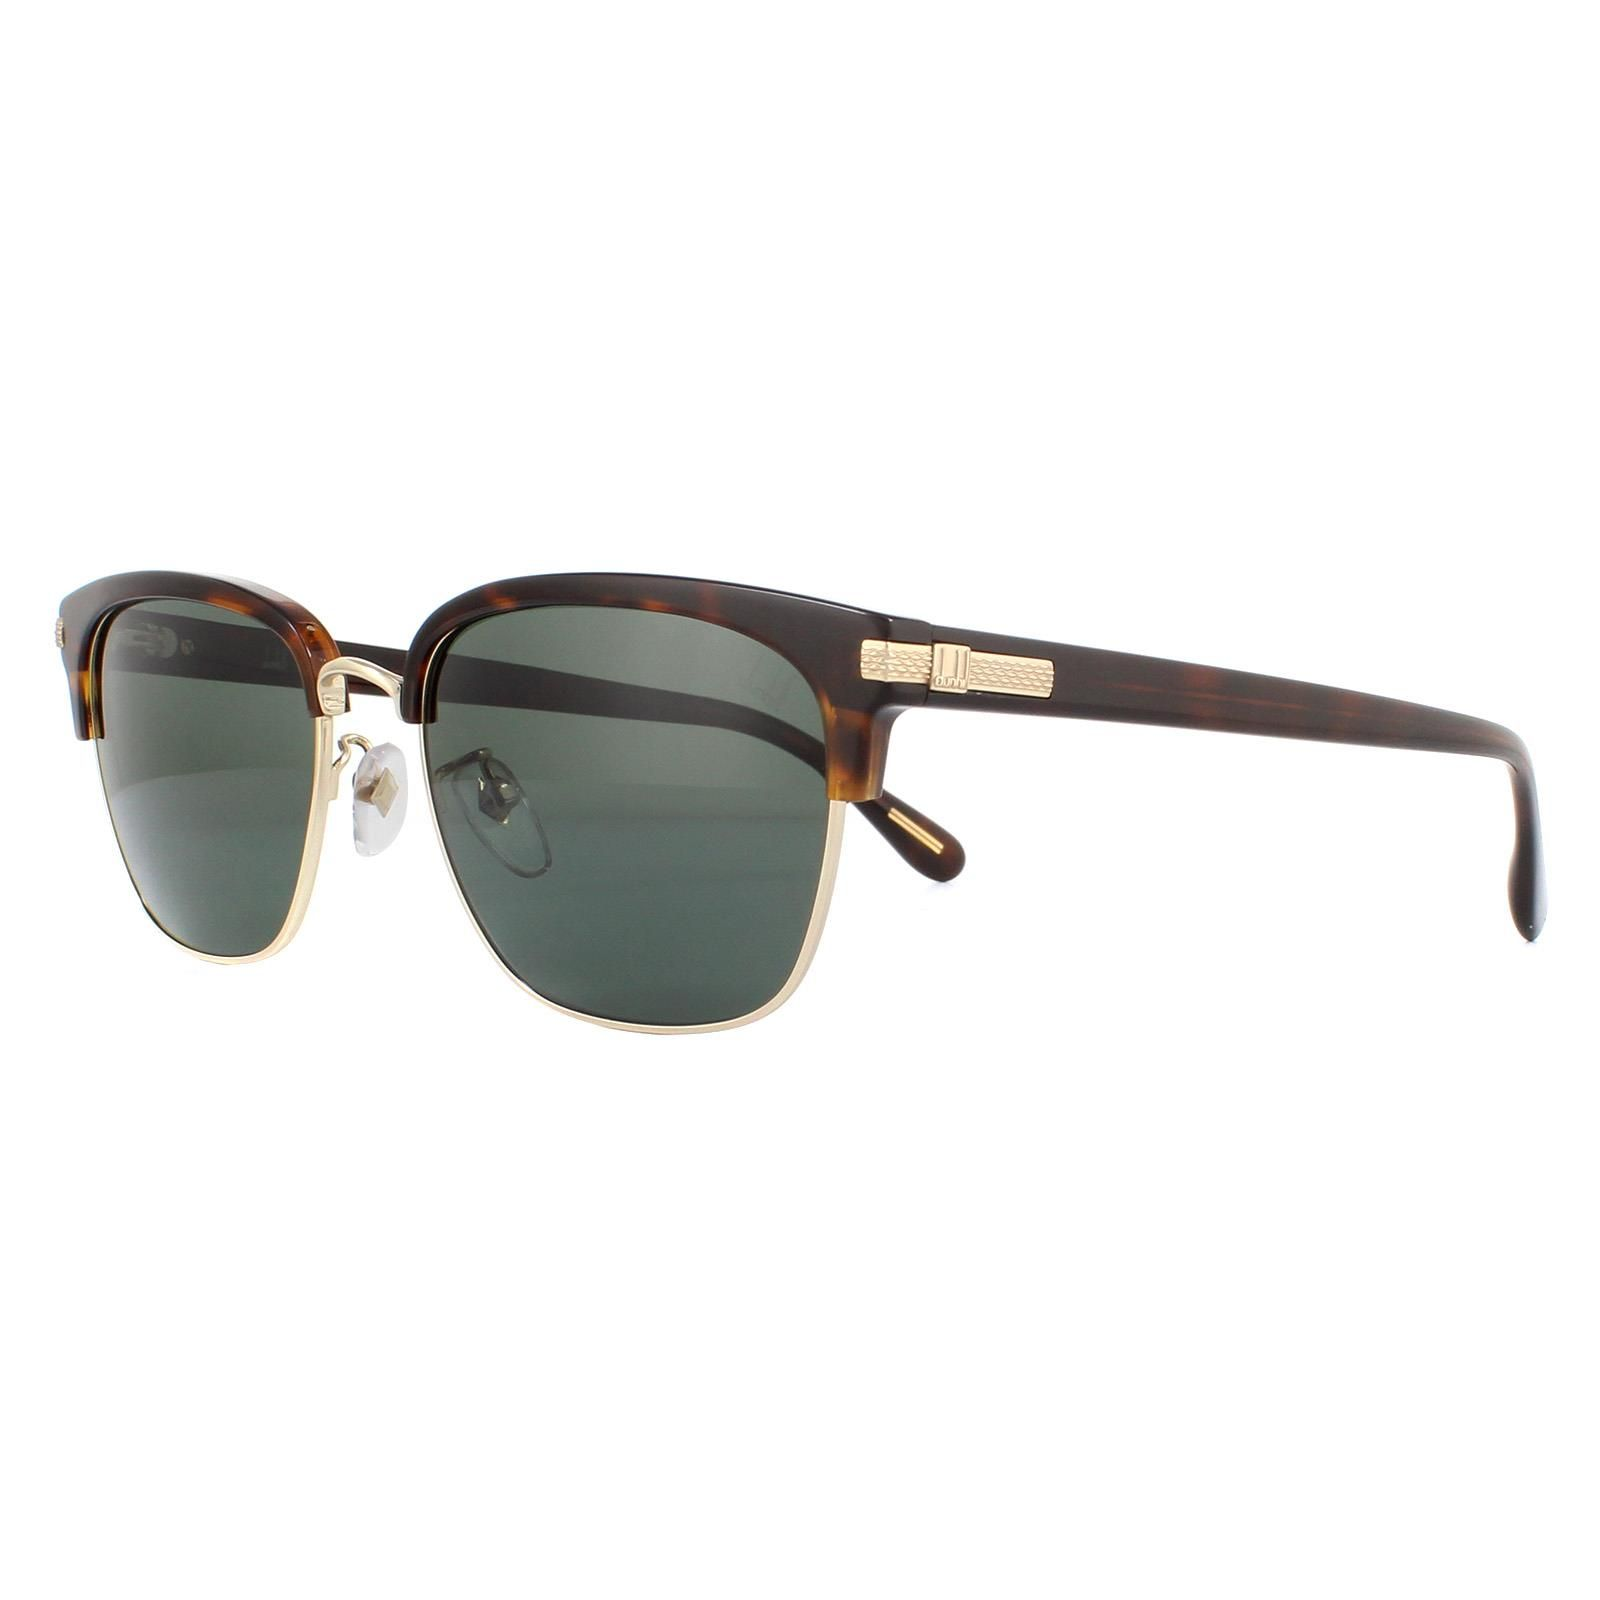 Dunhill Sunglasses SDH196M 300Z Shiny Rose Gold Black Some Grey